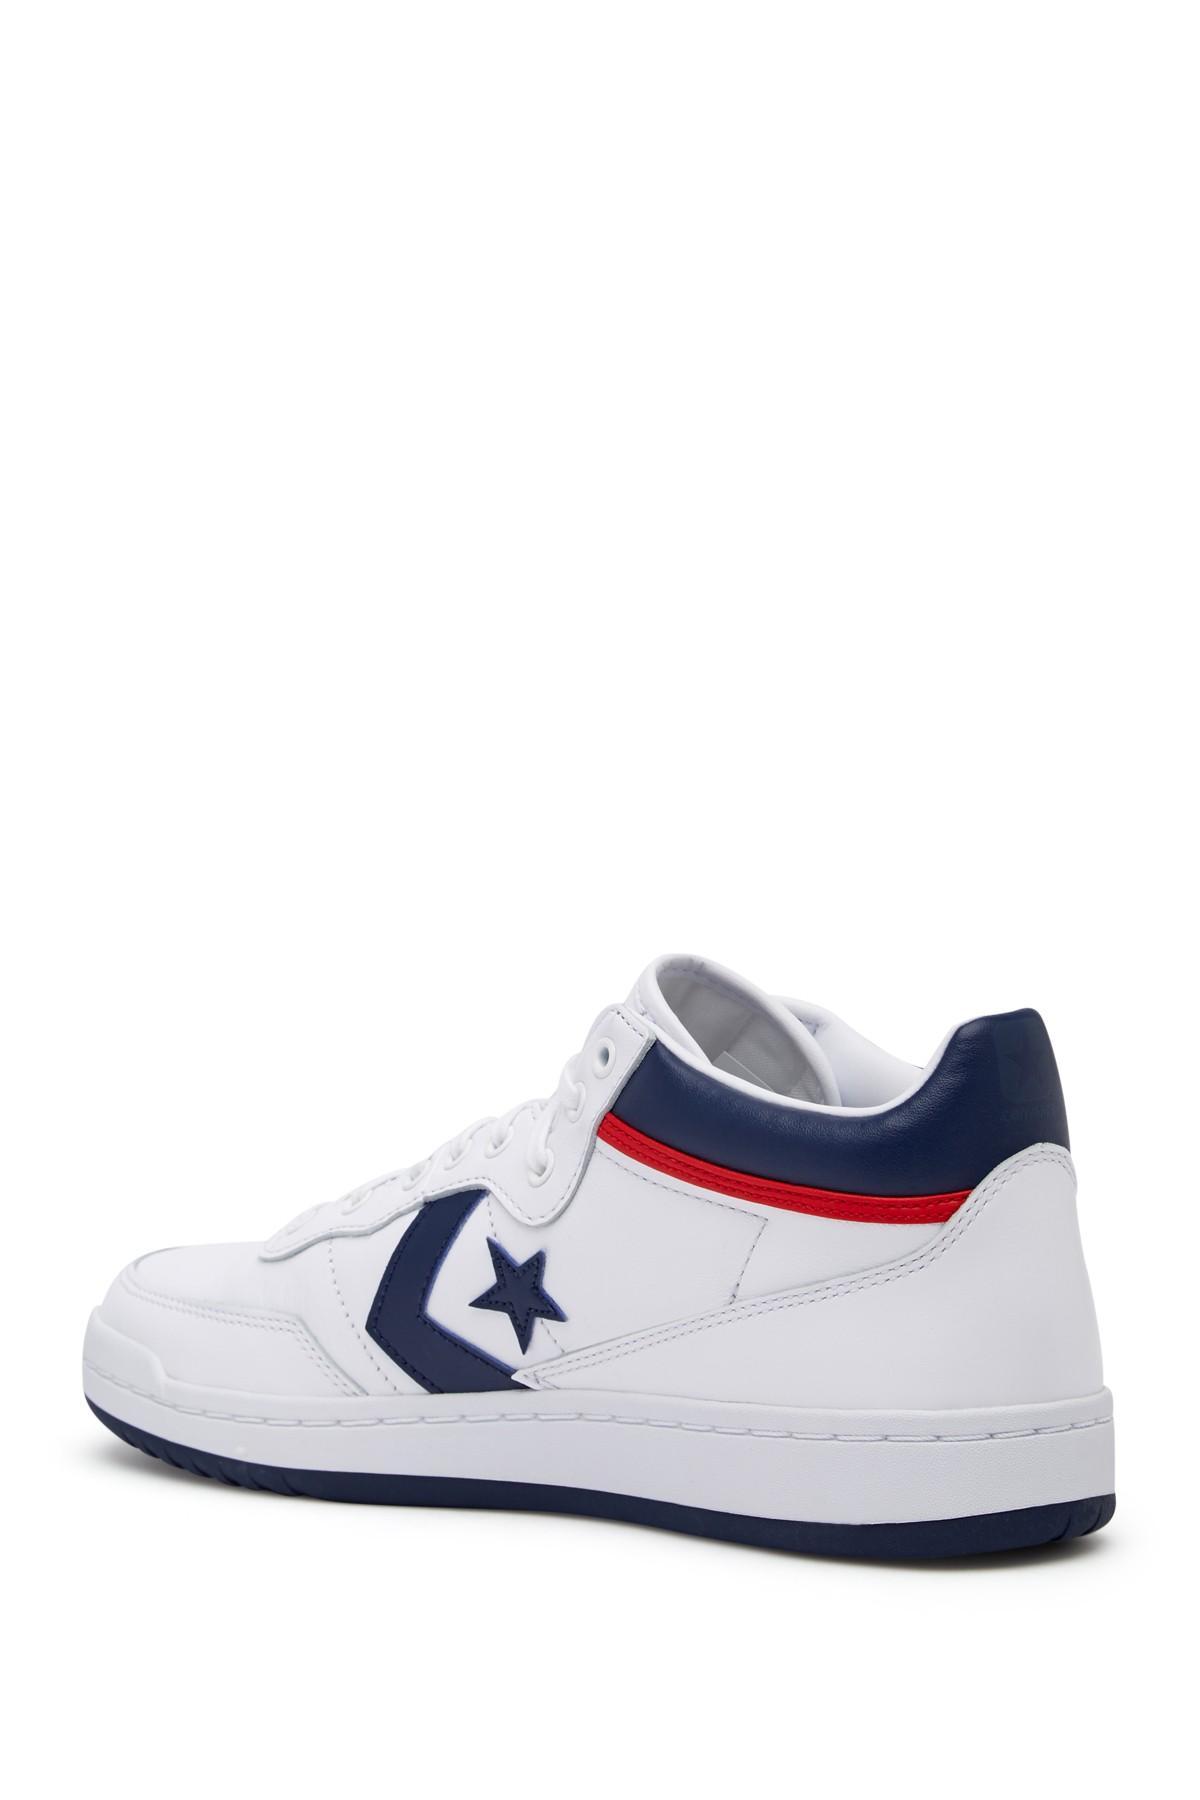 Converse Fastbreak 83 Mid Leather Sneaker (unisex) in White ...